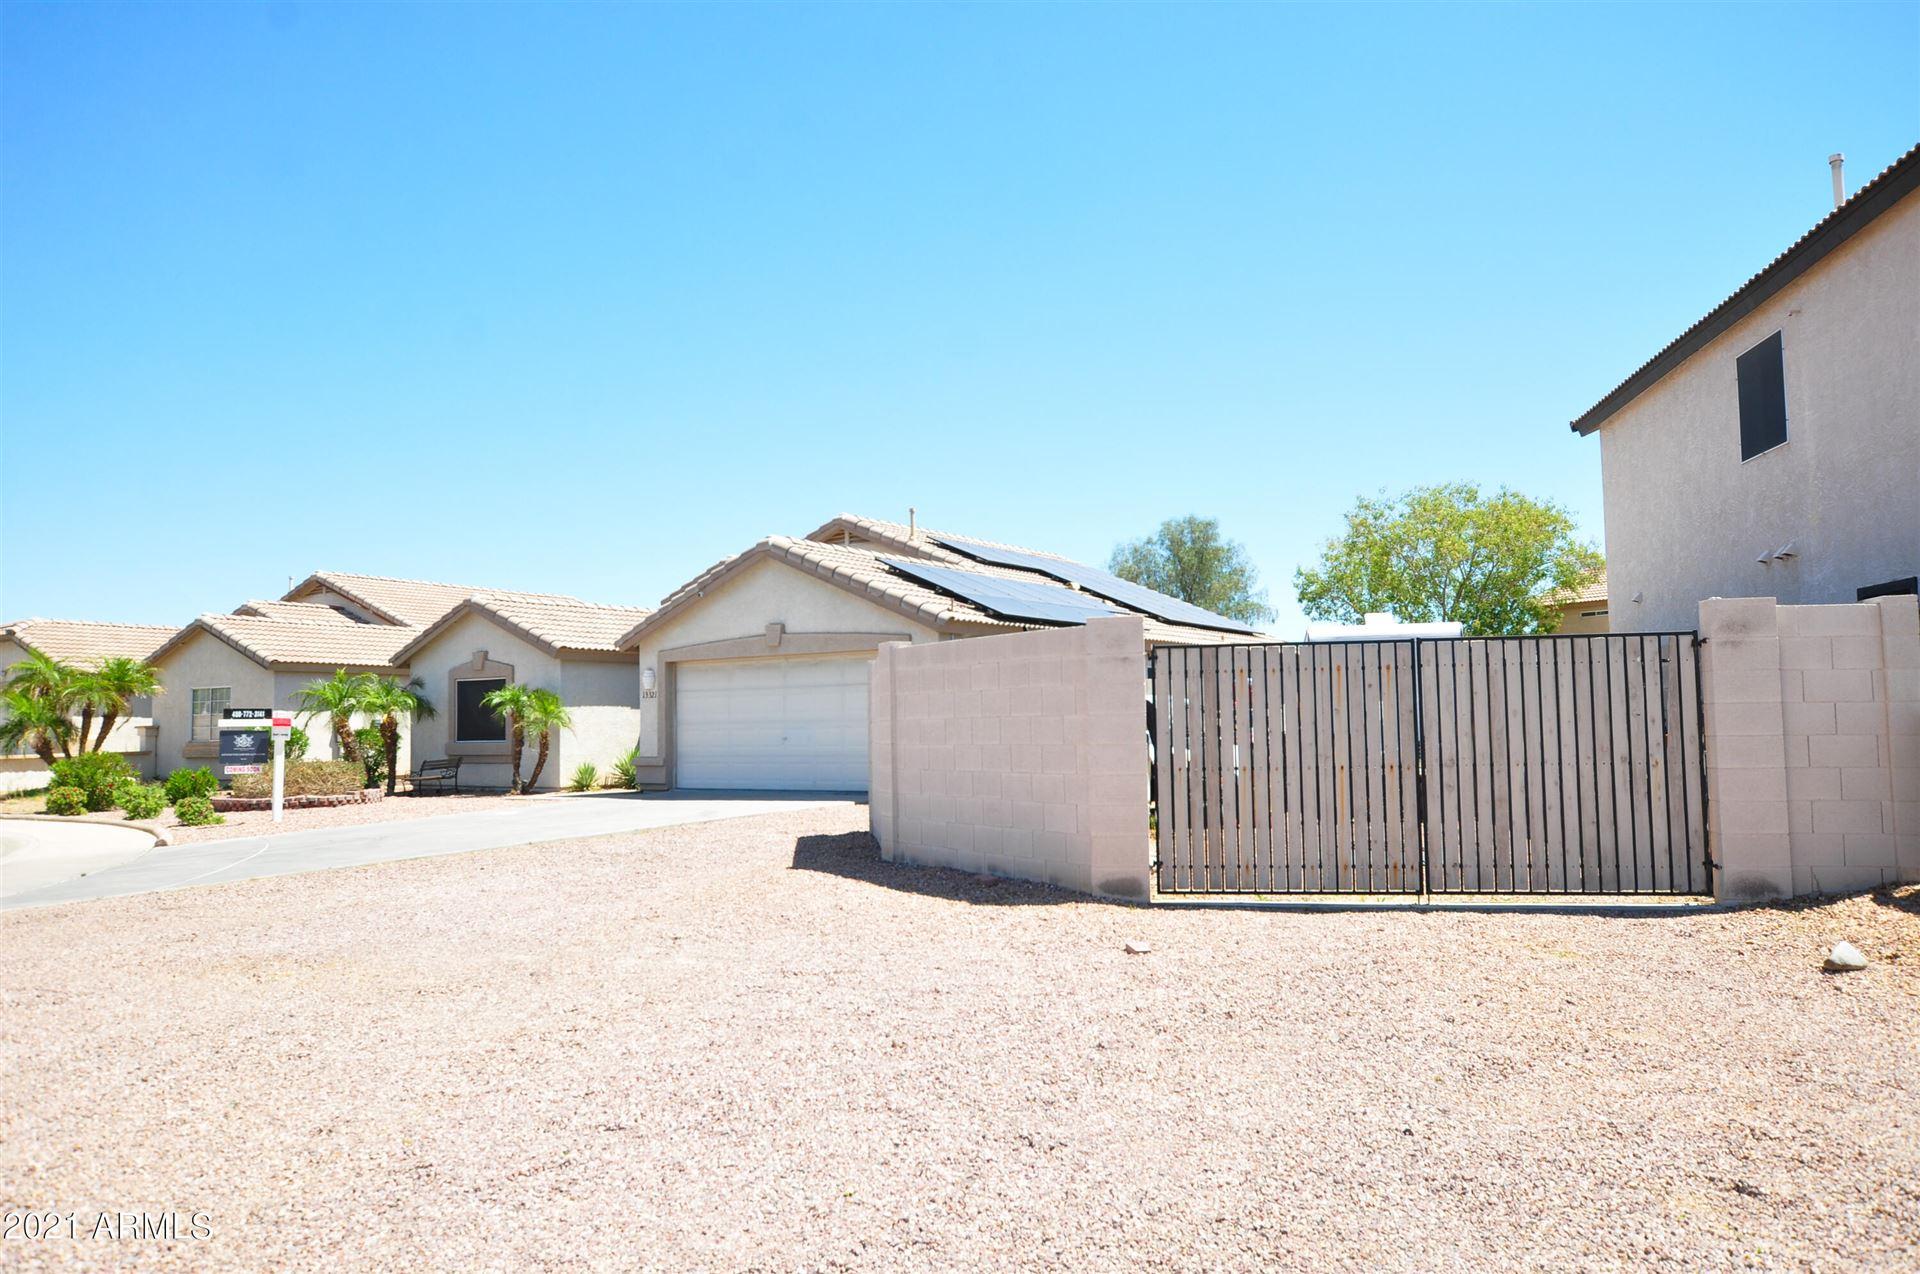 Photo of 13321 N 126TH Drive, El Mirage, AZ 85335 (MLS # 6226929)